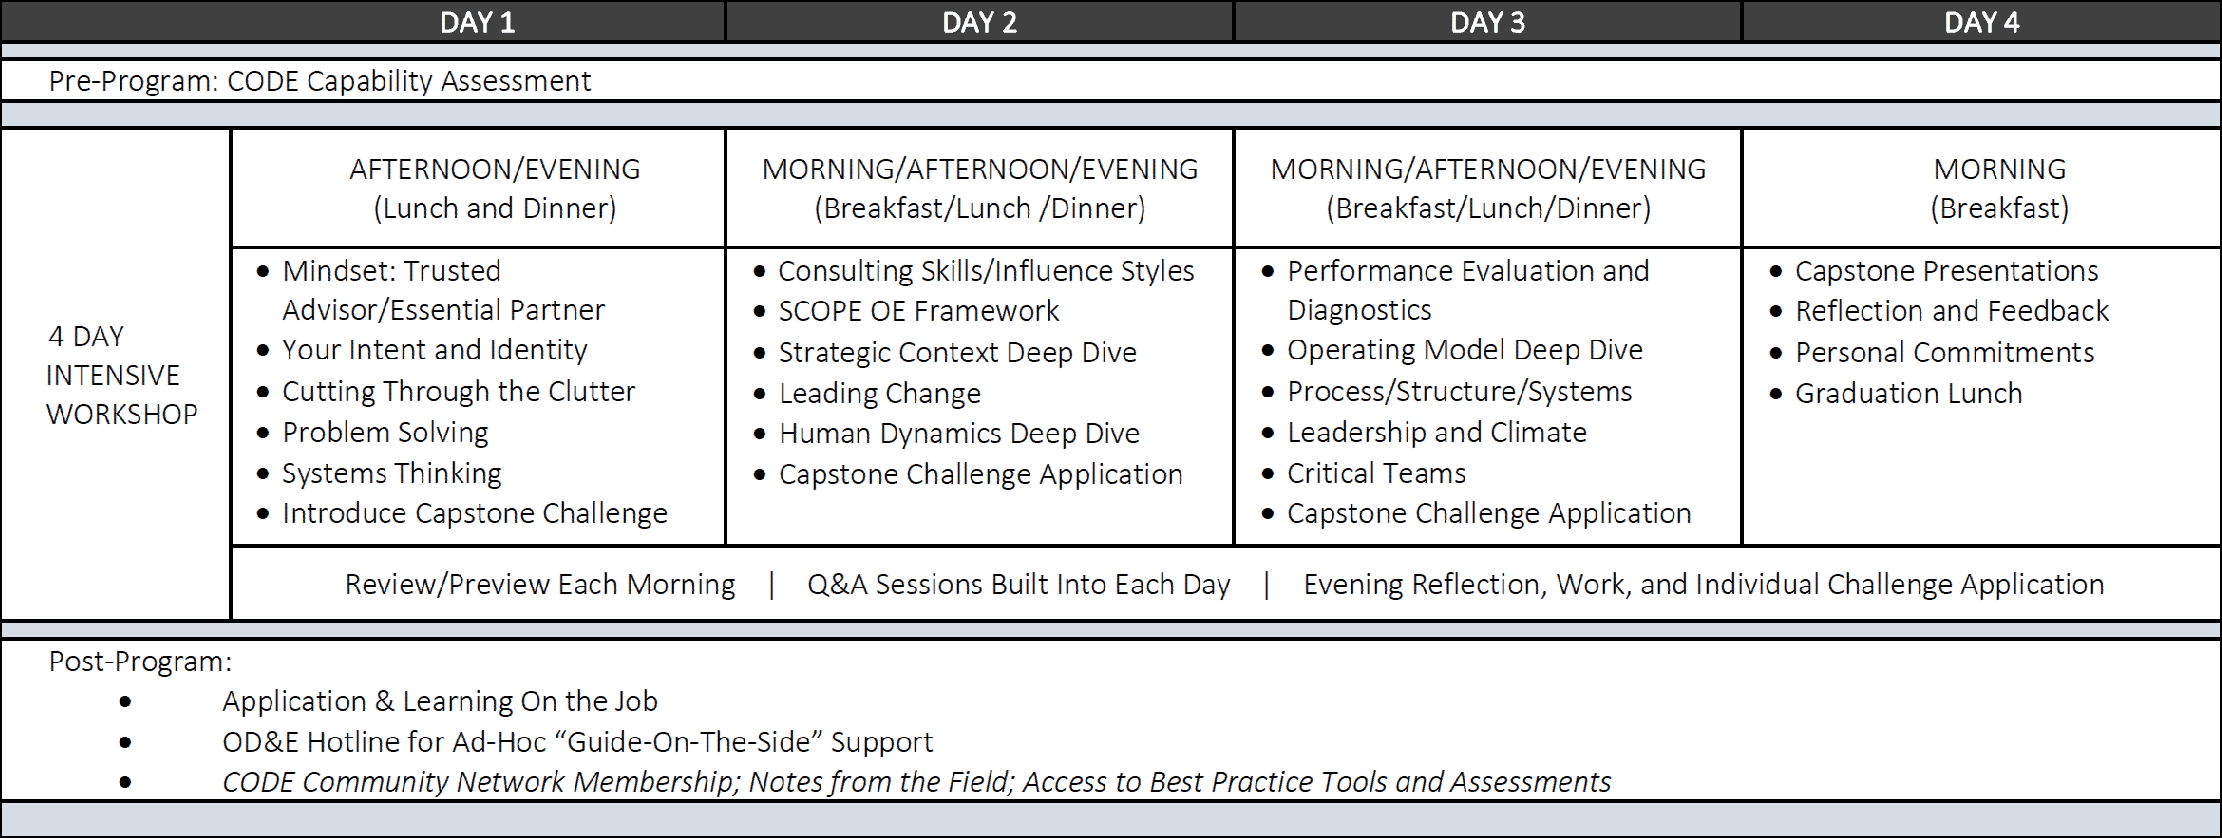 4-day intensive live chart - retina